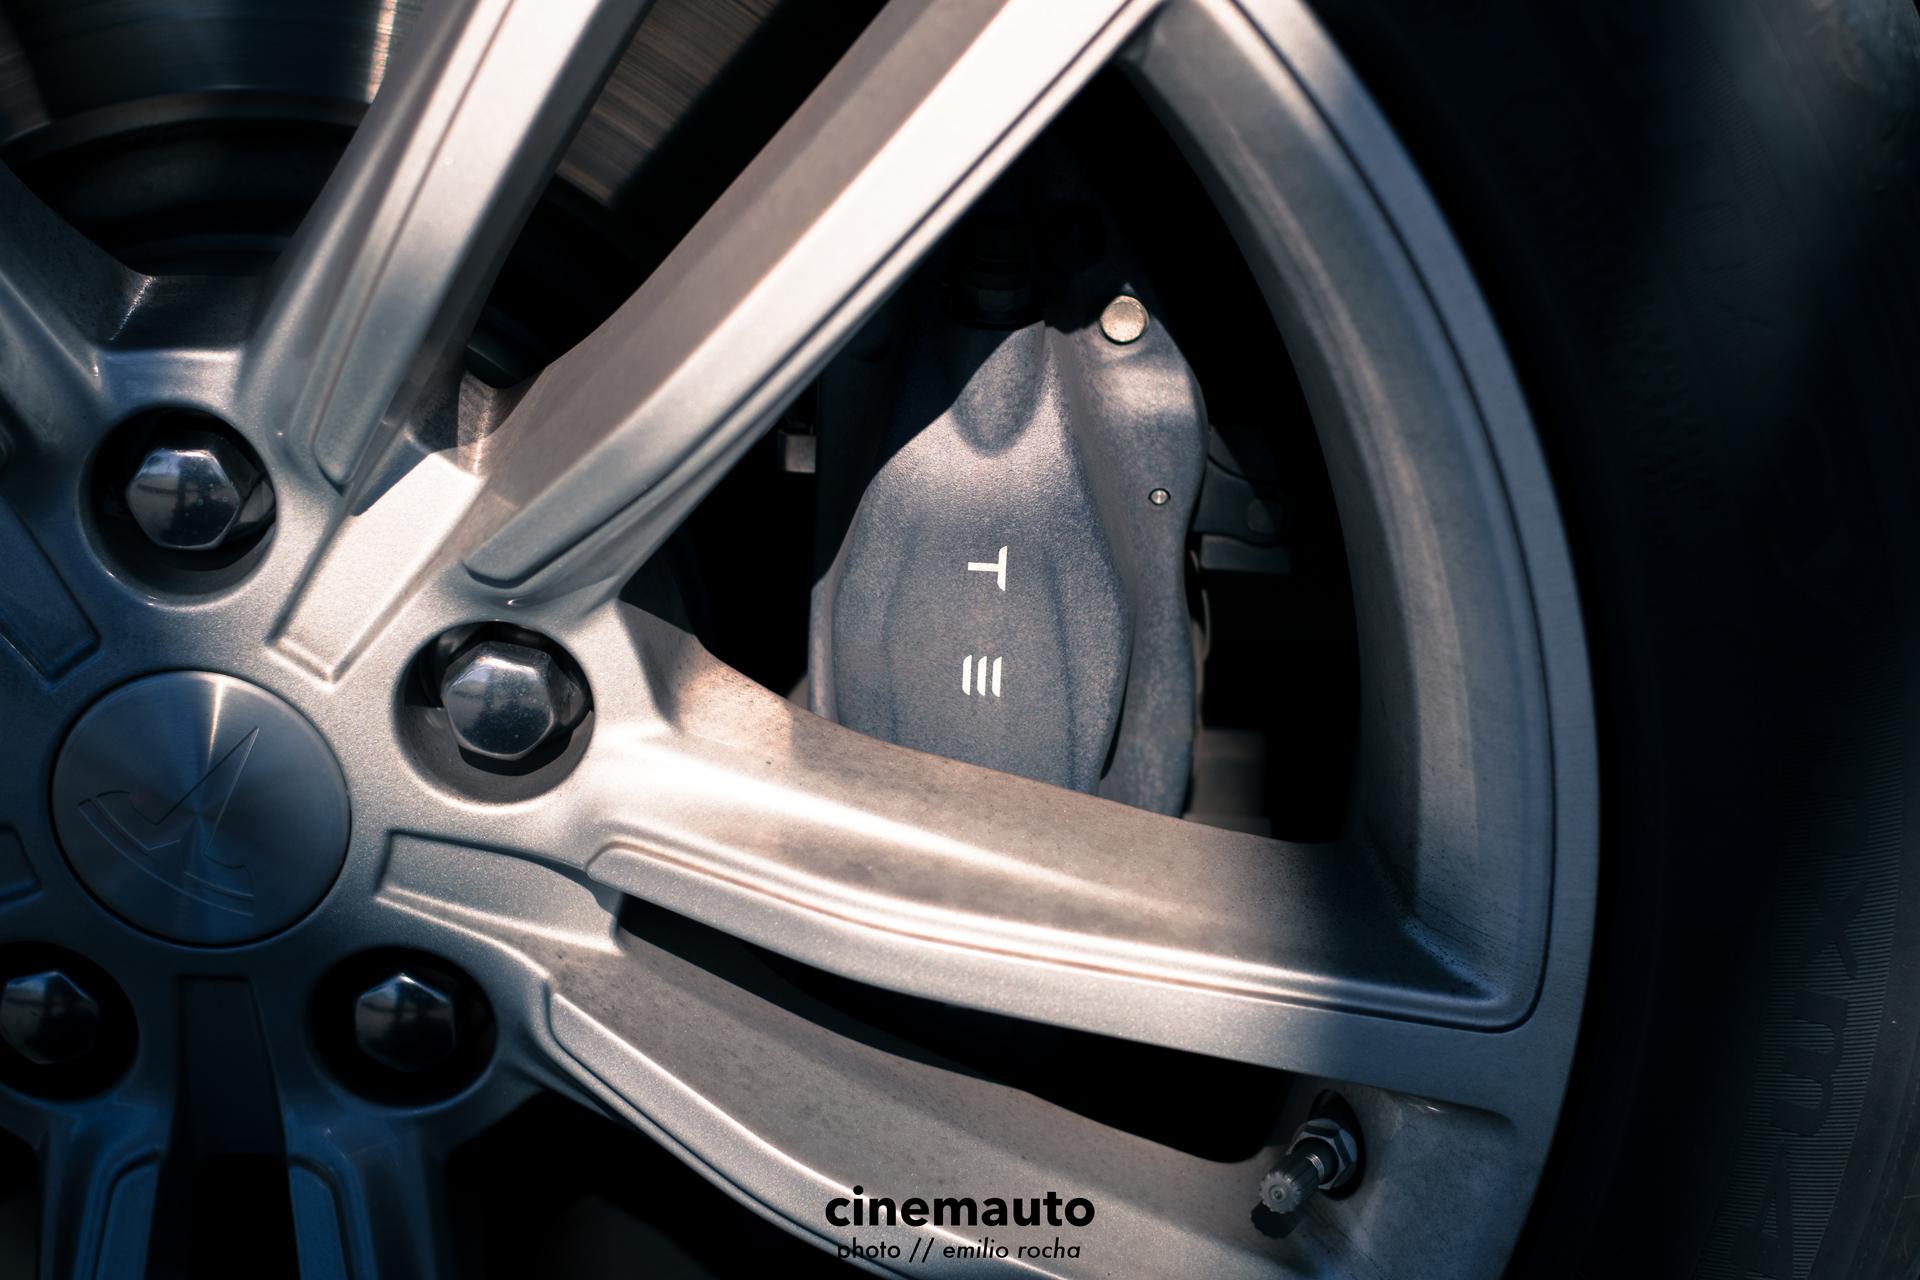 TeslaCinemauto-22.jpg